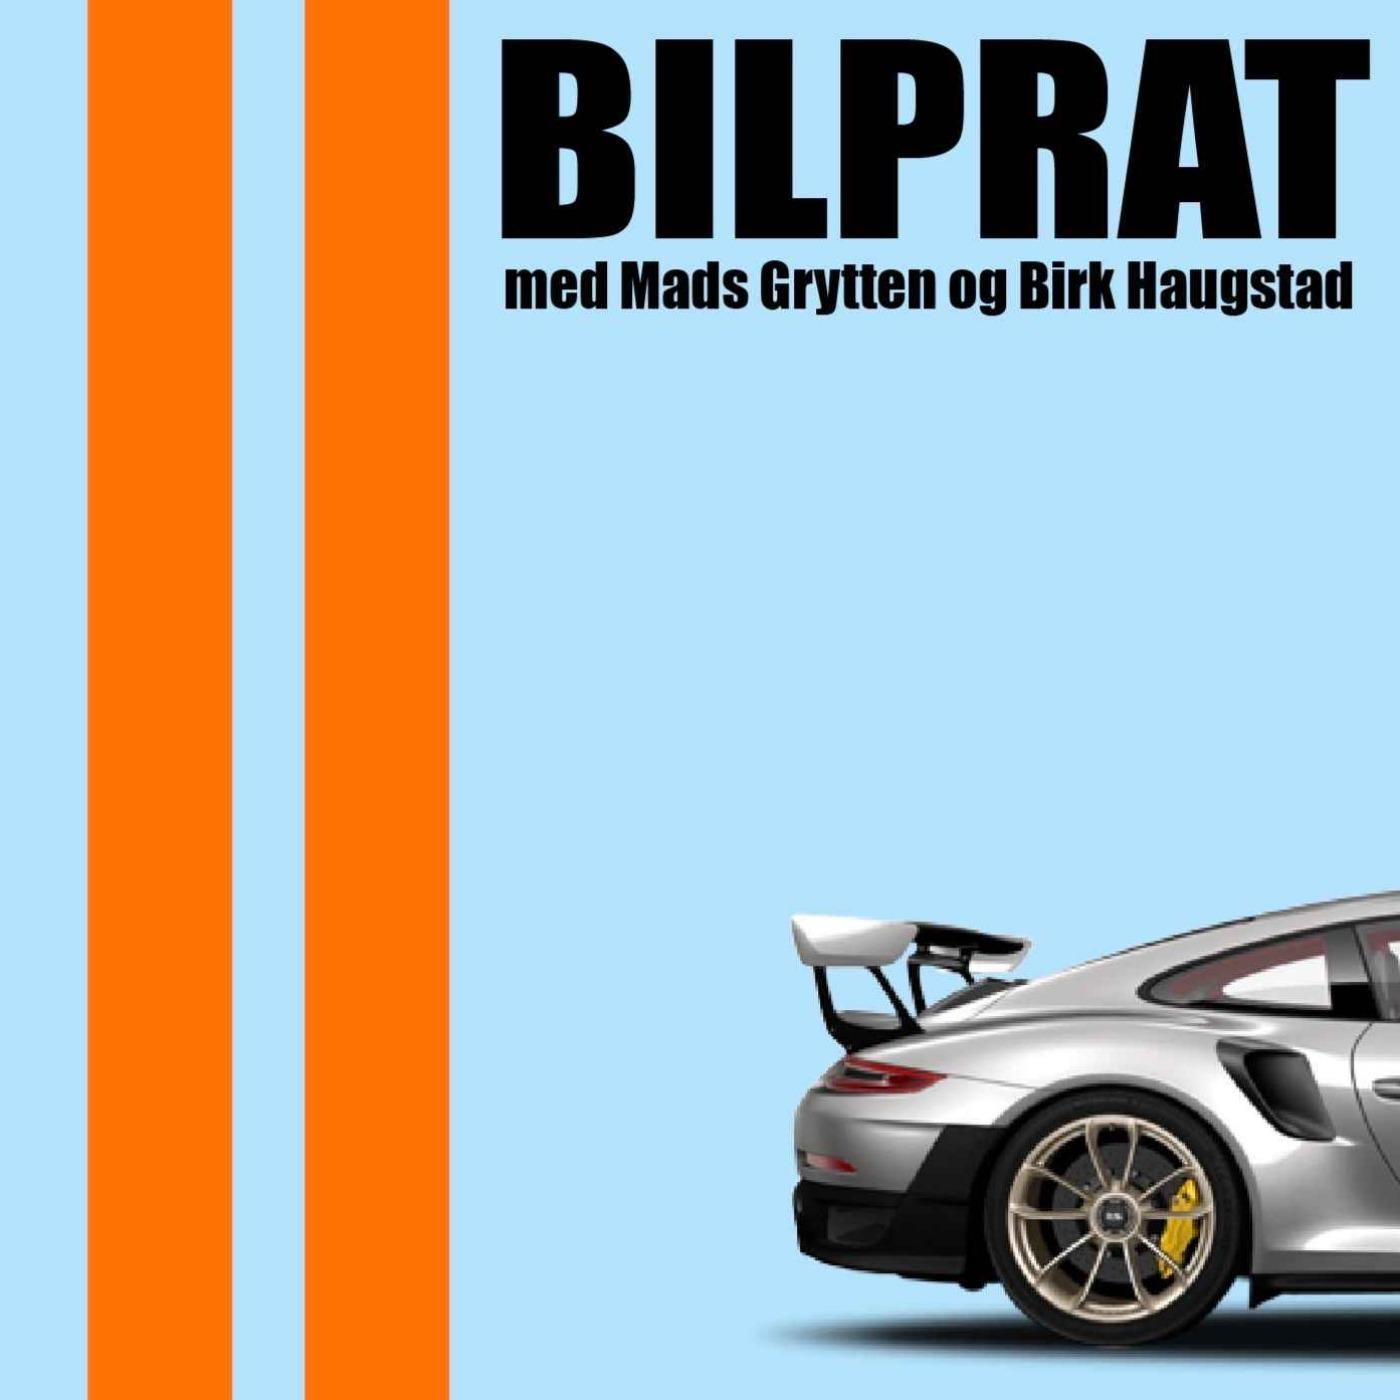 S03E05 - Norges svar på Fast & Furious? og nye RUF CTR Anniversary.